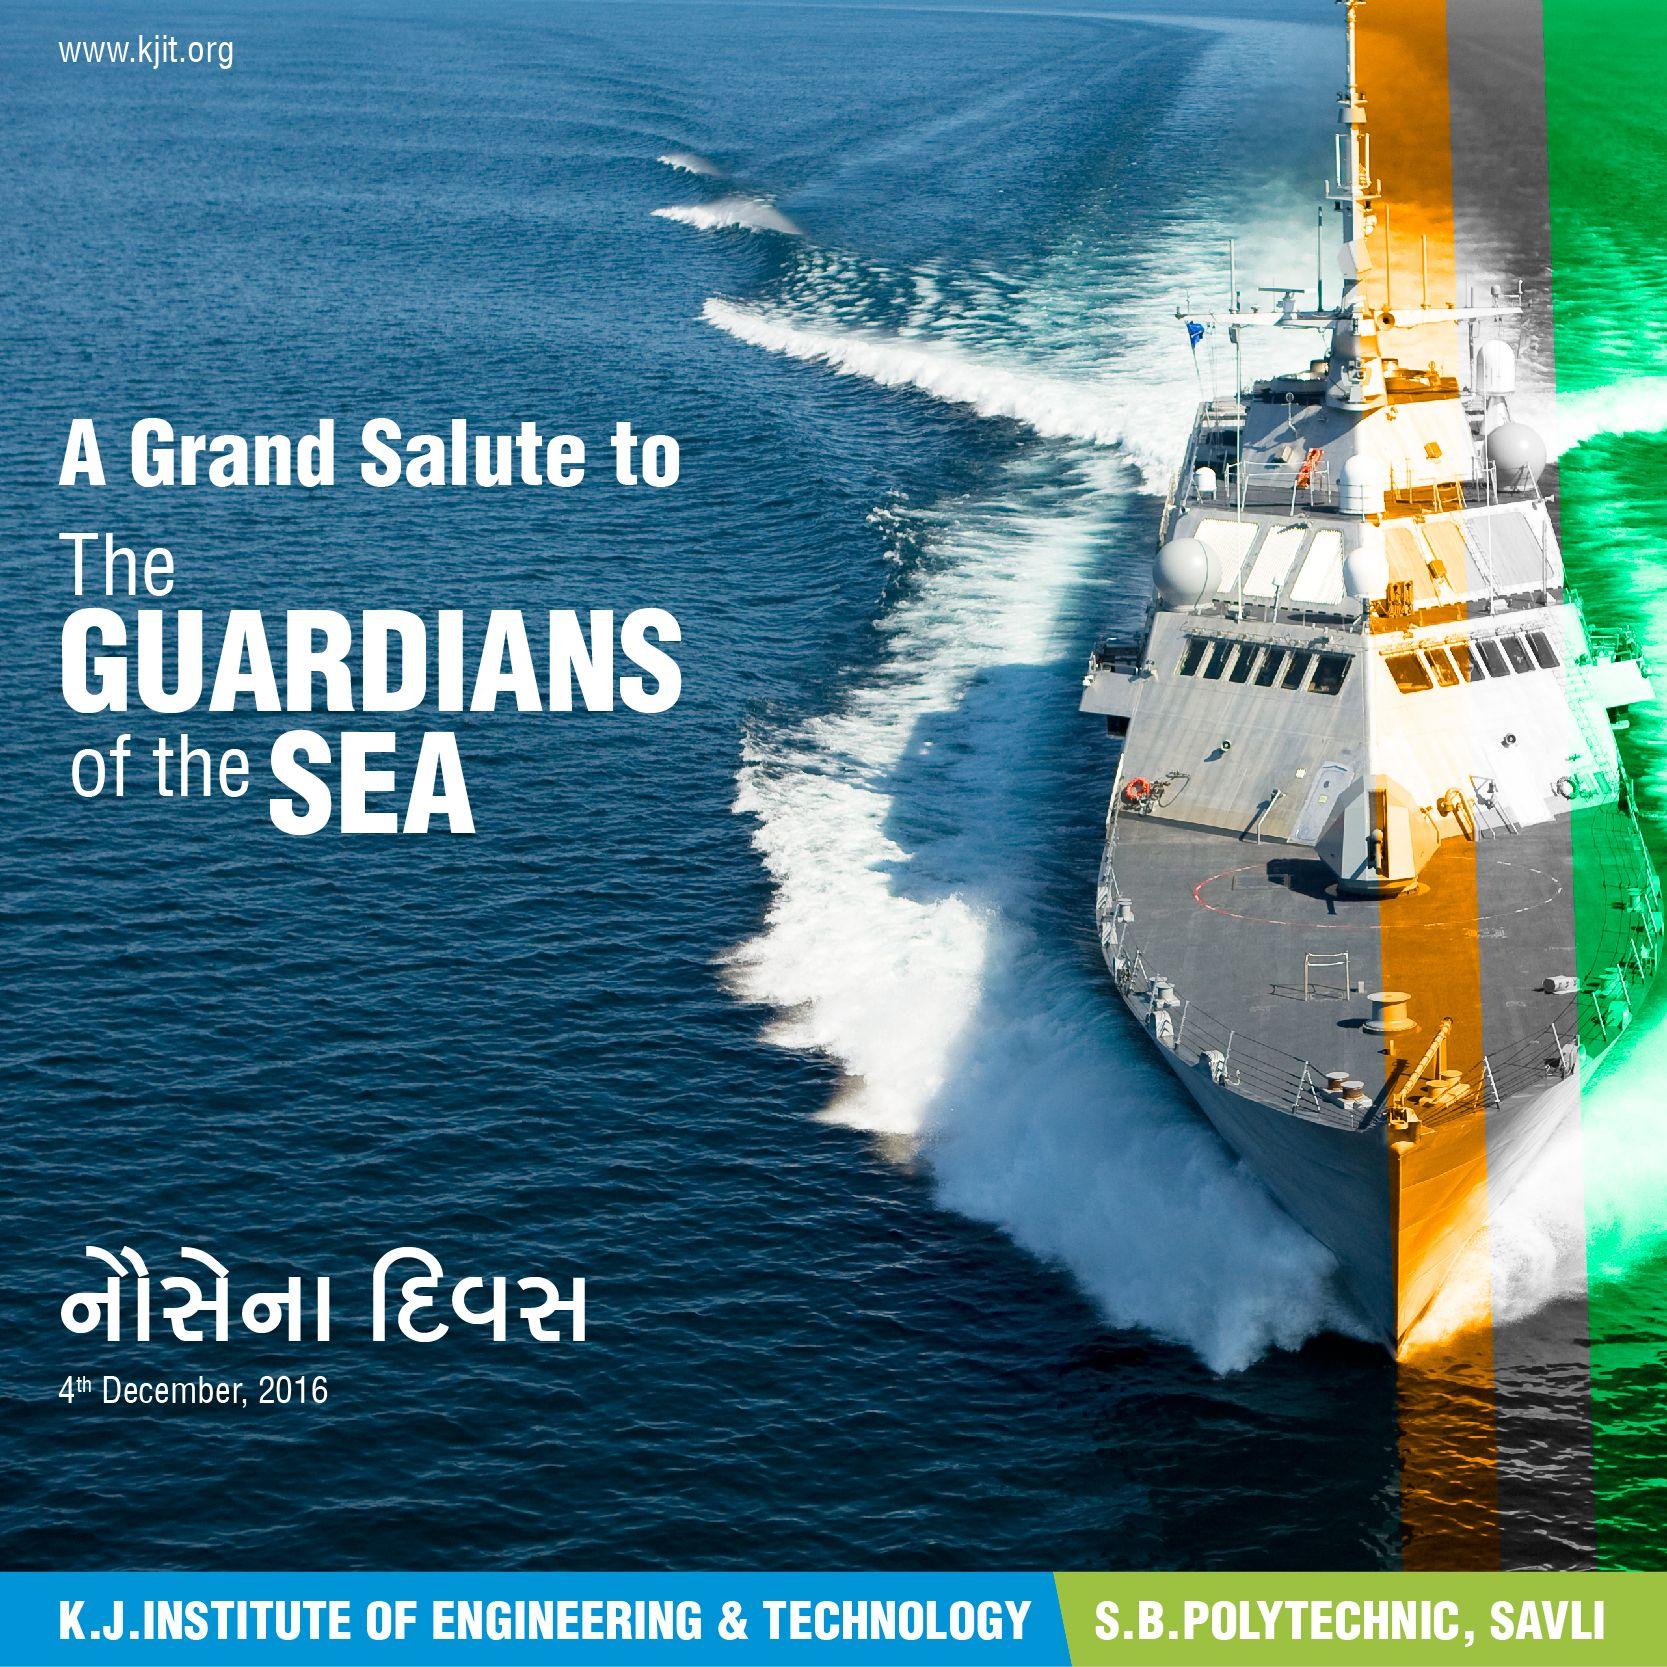 Guarding the coastal areas of India are the brave sea